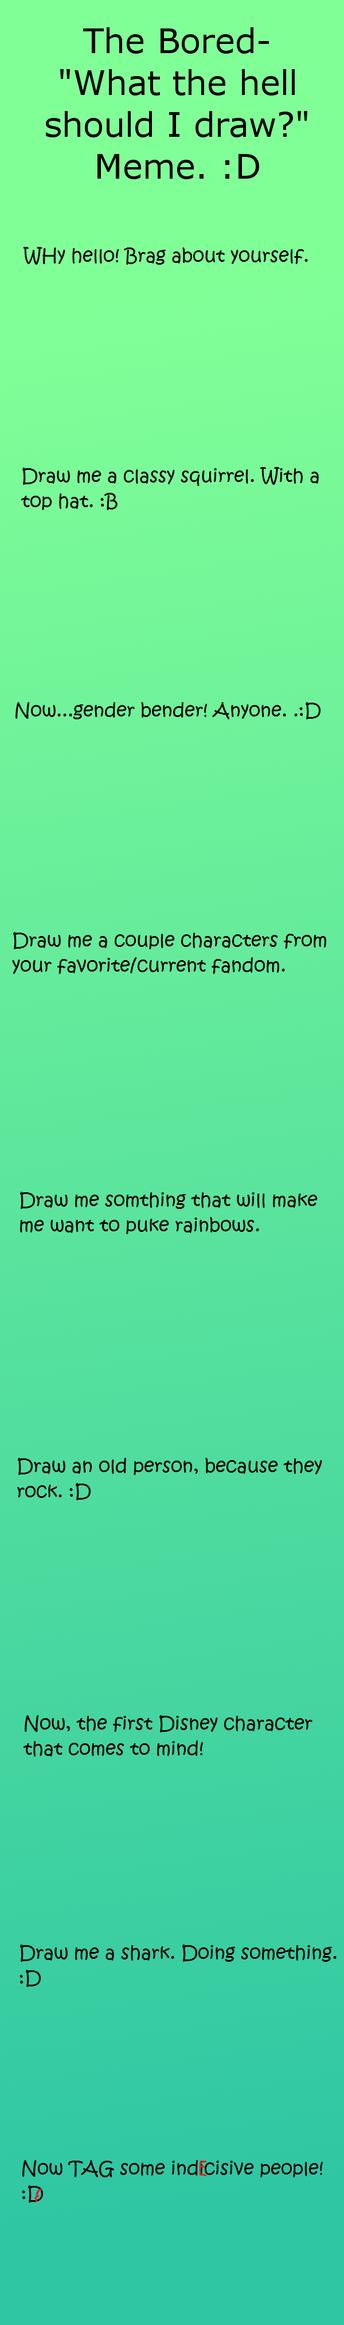 What should I drawMeme by RandomArtz95